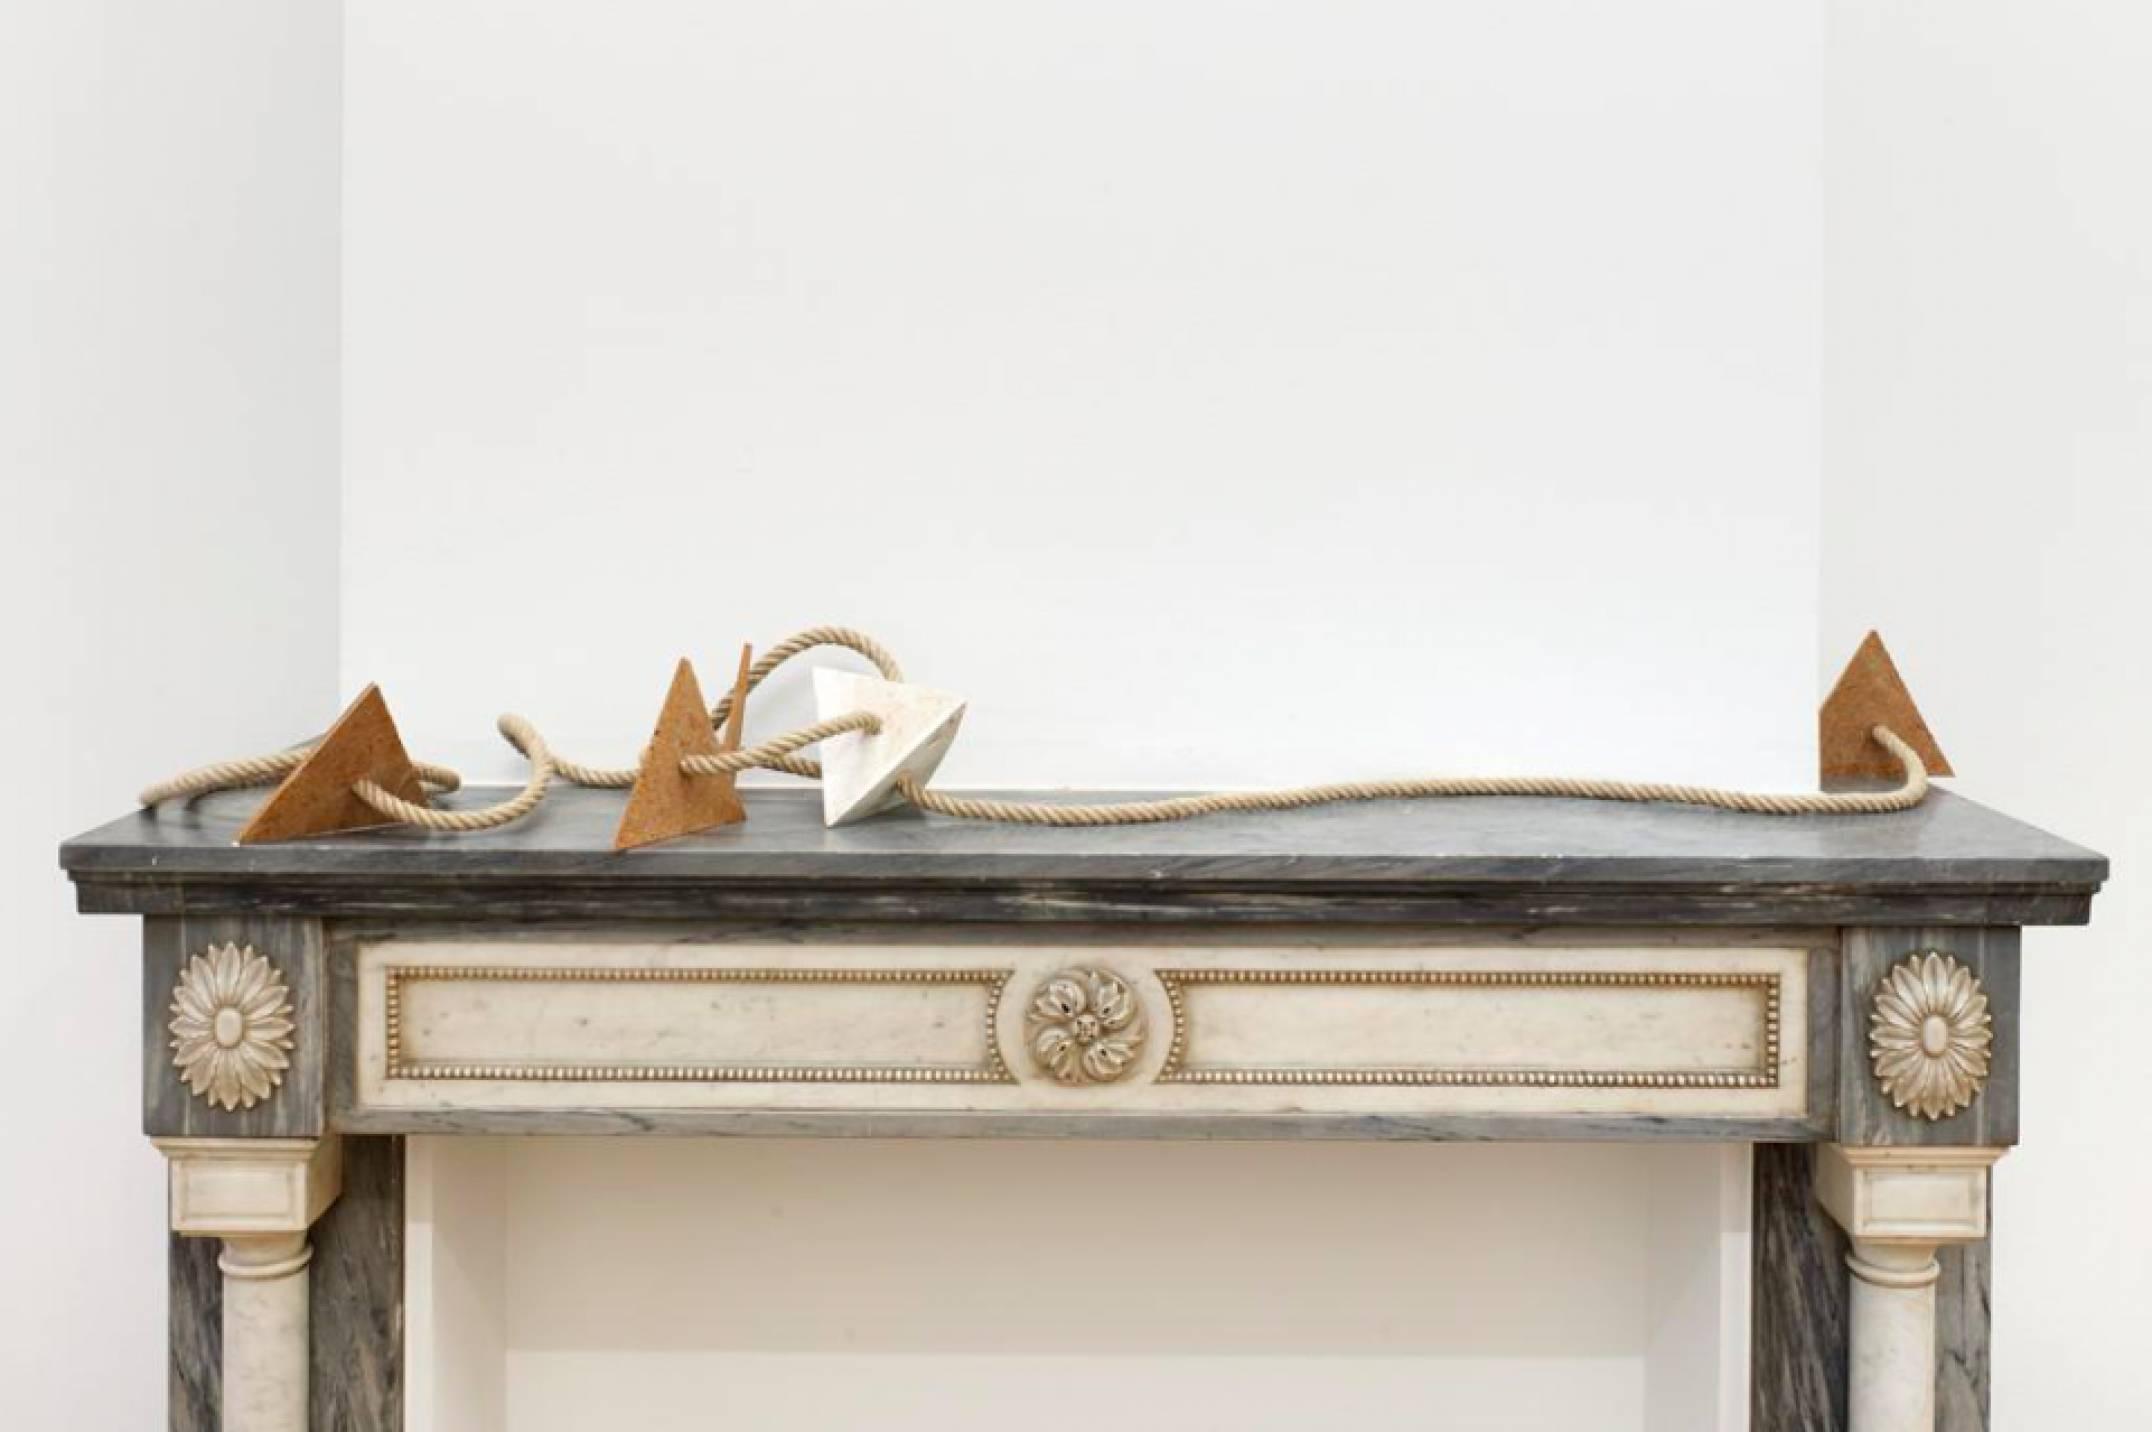 Mariana Castillo Deball, <em>Xipe Tetrahedron III</em>, 2017, pigmented plaster and hemp rope,37 × 27 × 24 cm - Mendes Wood DM